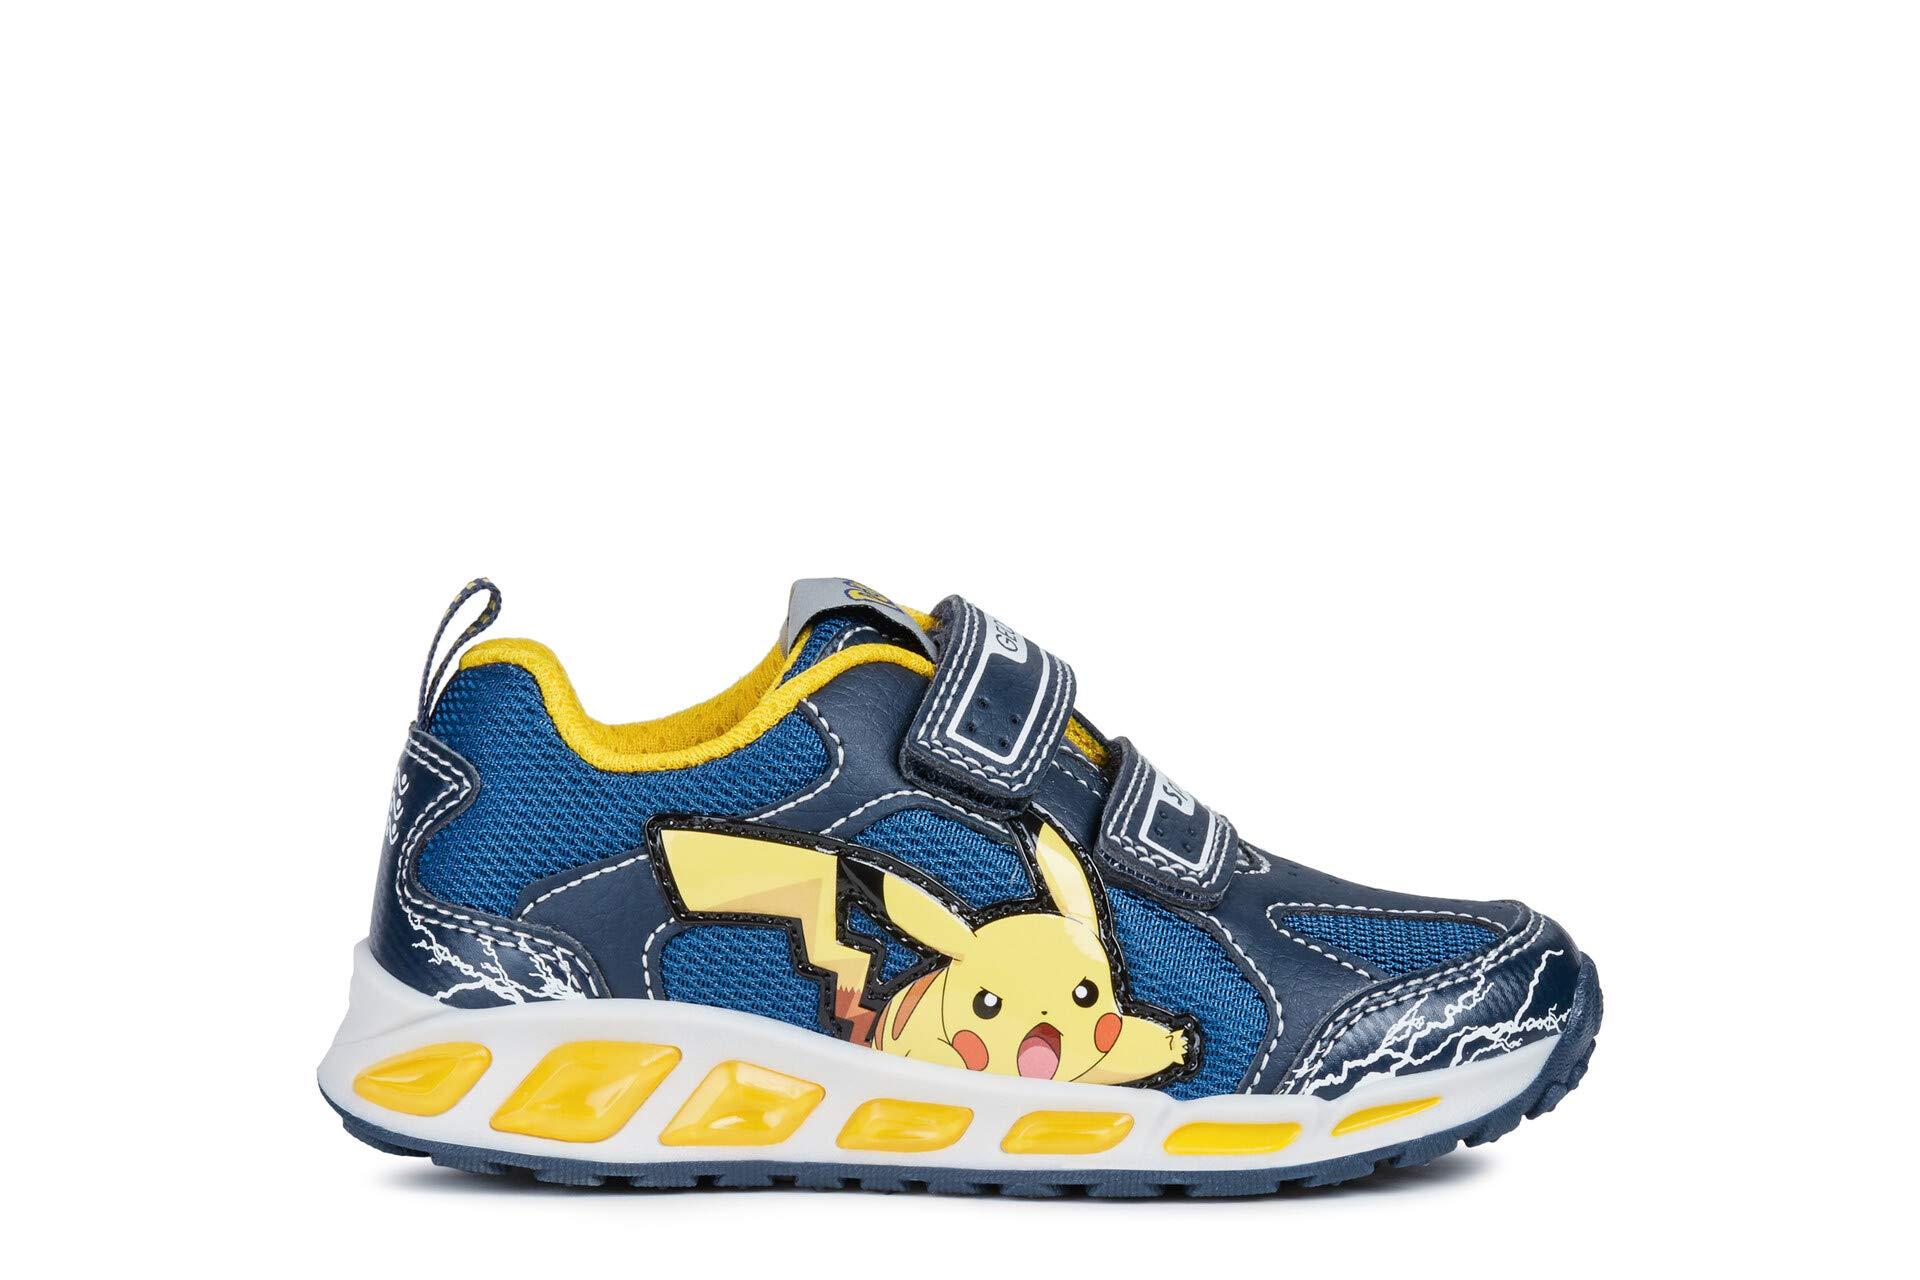 Geox C4054 NavyYellow Scarpa Bambino Sneakers J8294C